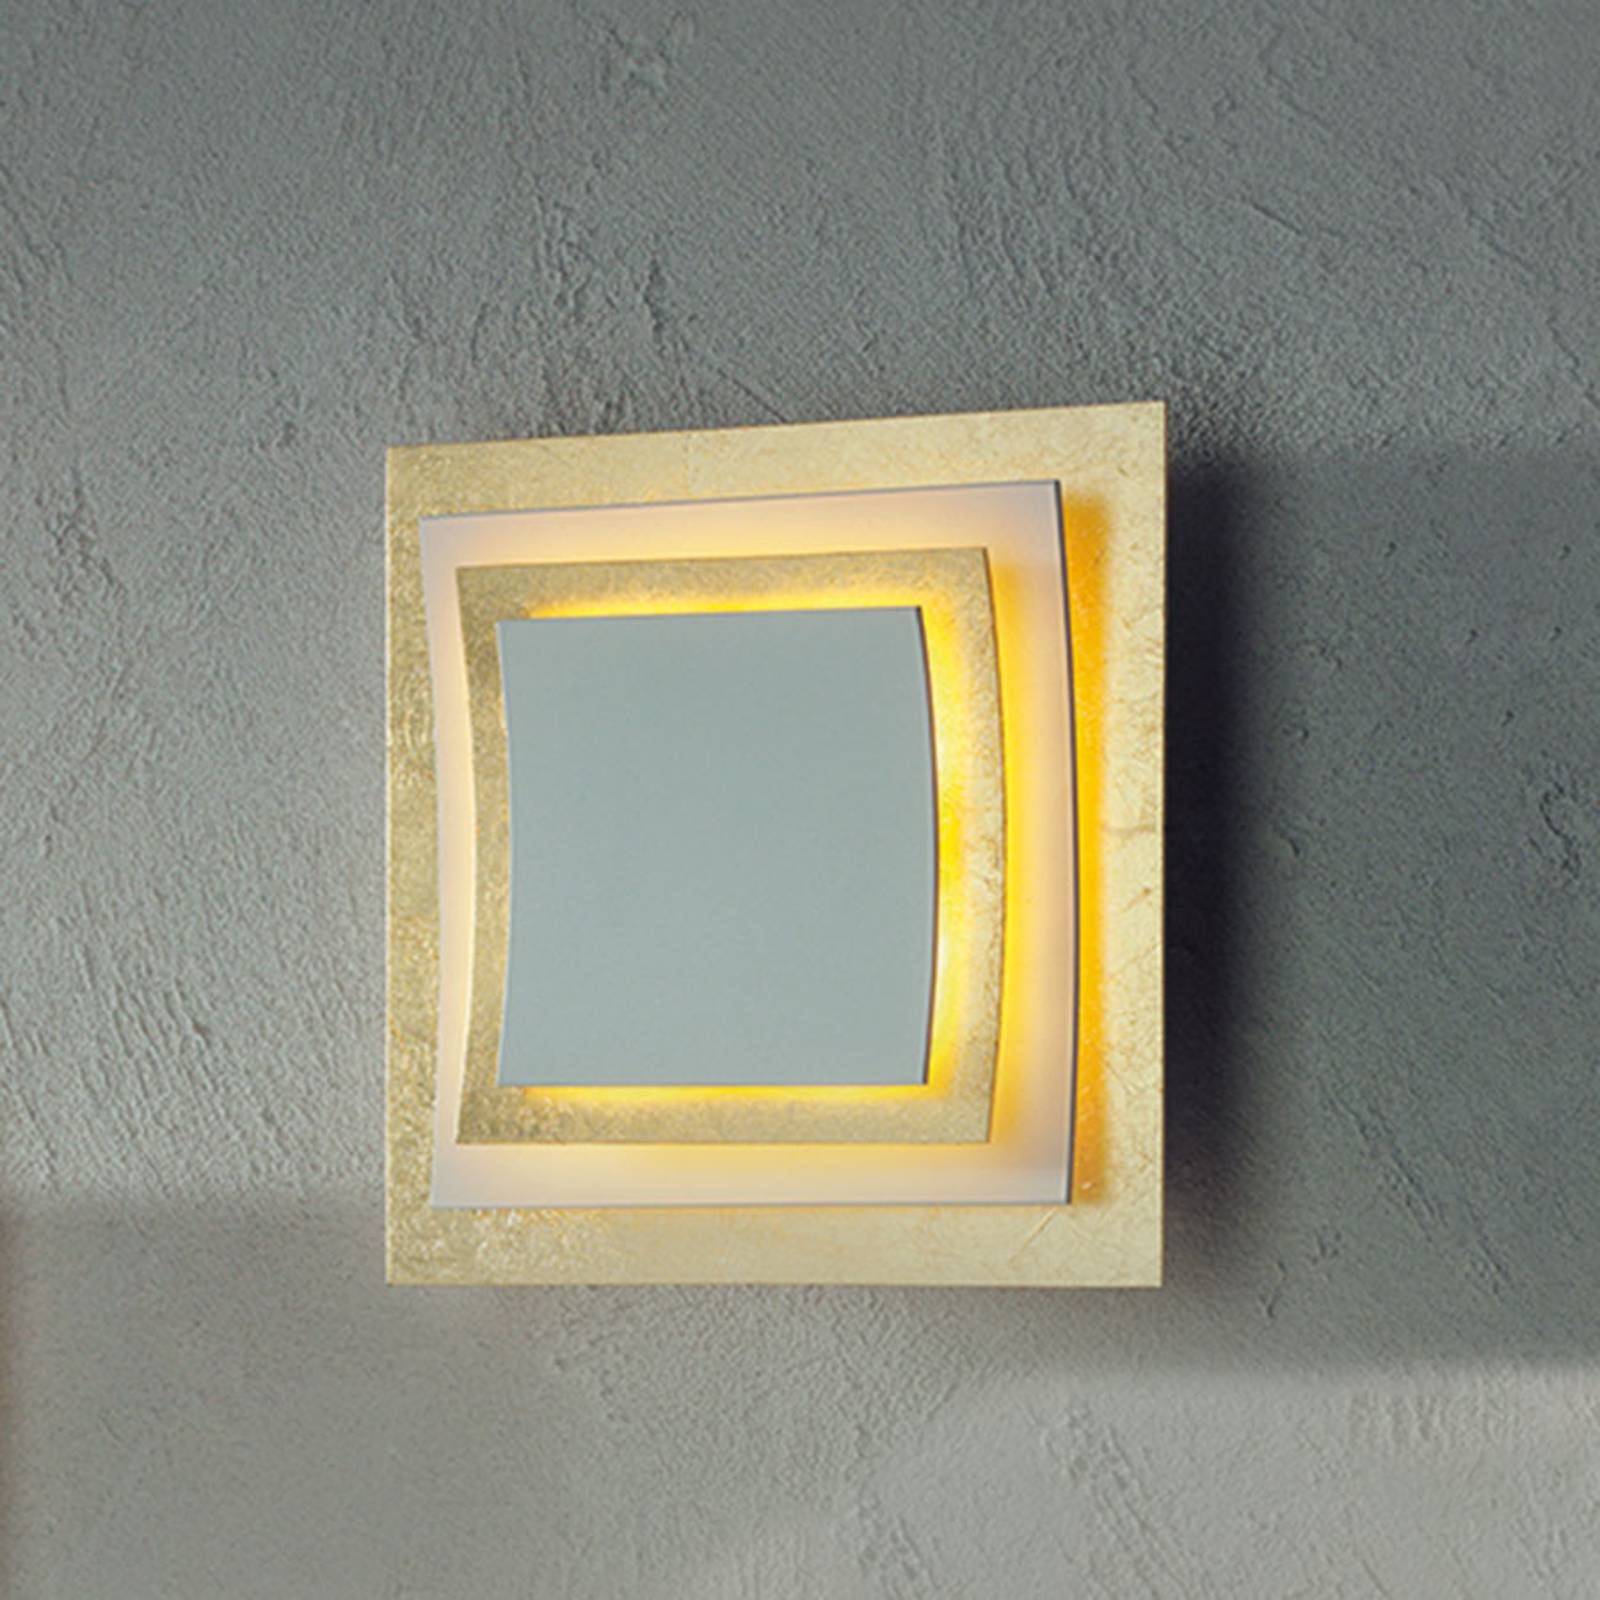 Wand- en plafondlamp Pages, bladgoud, 22 cm